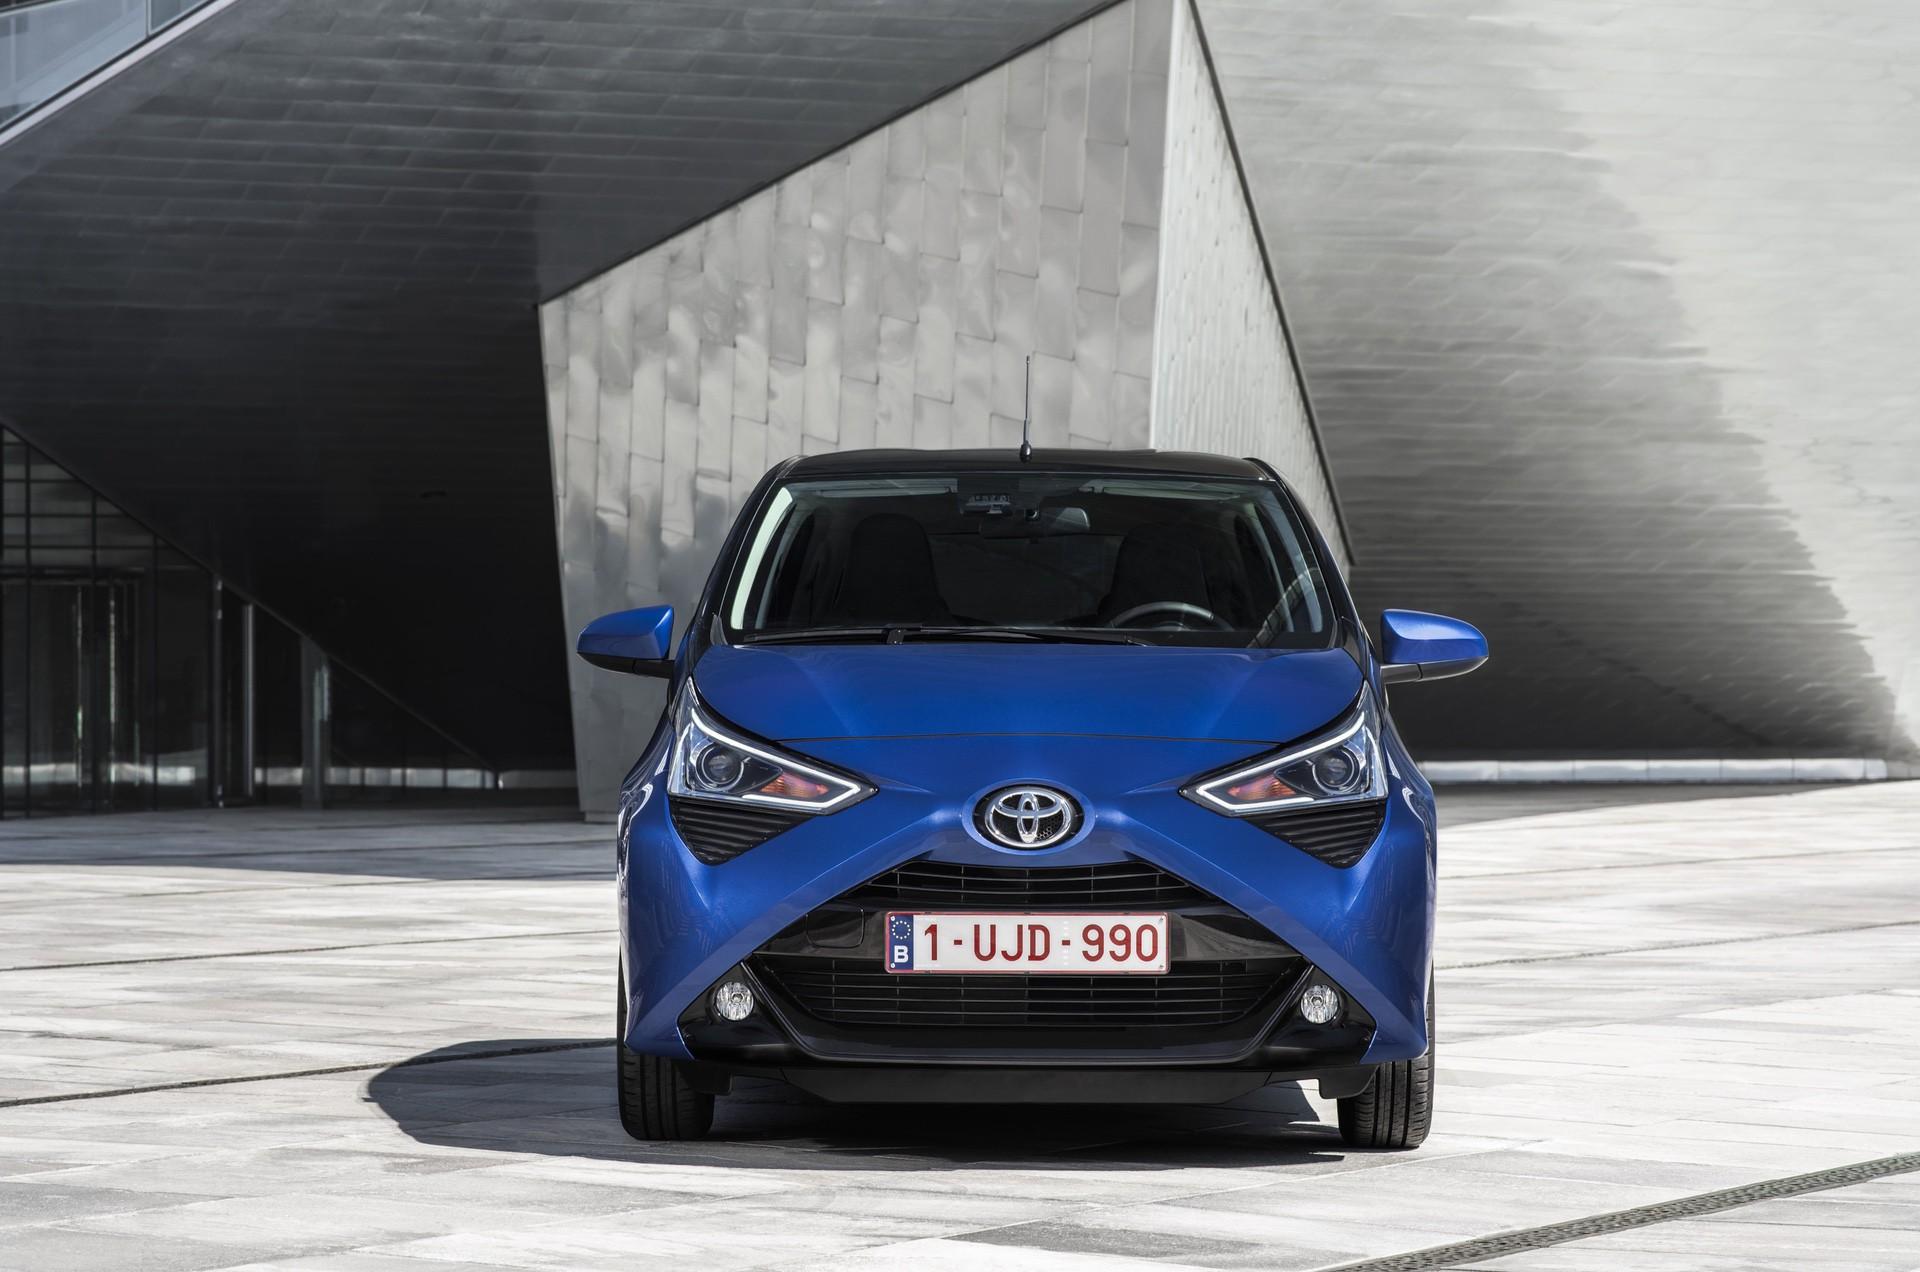 Toyota_Aygo_facelift_presskit_0033